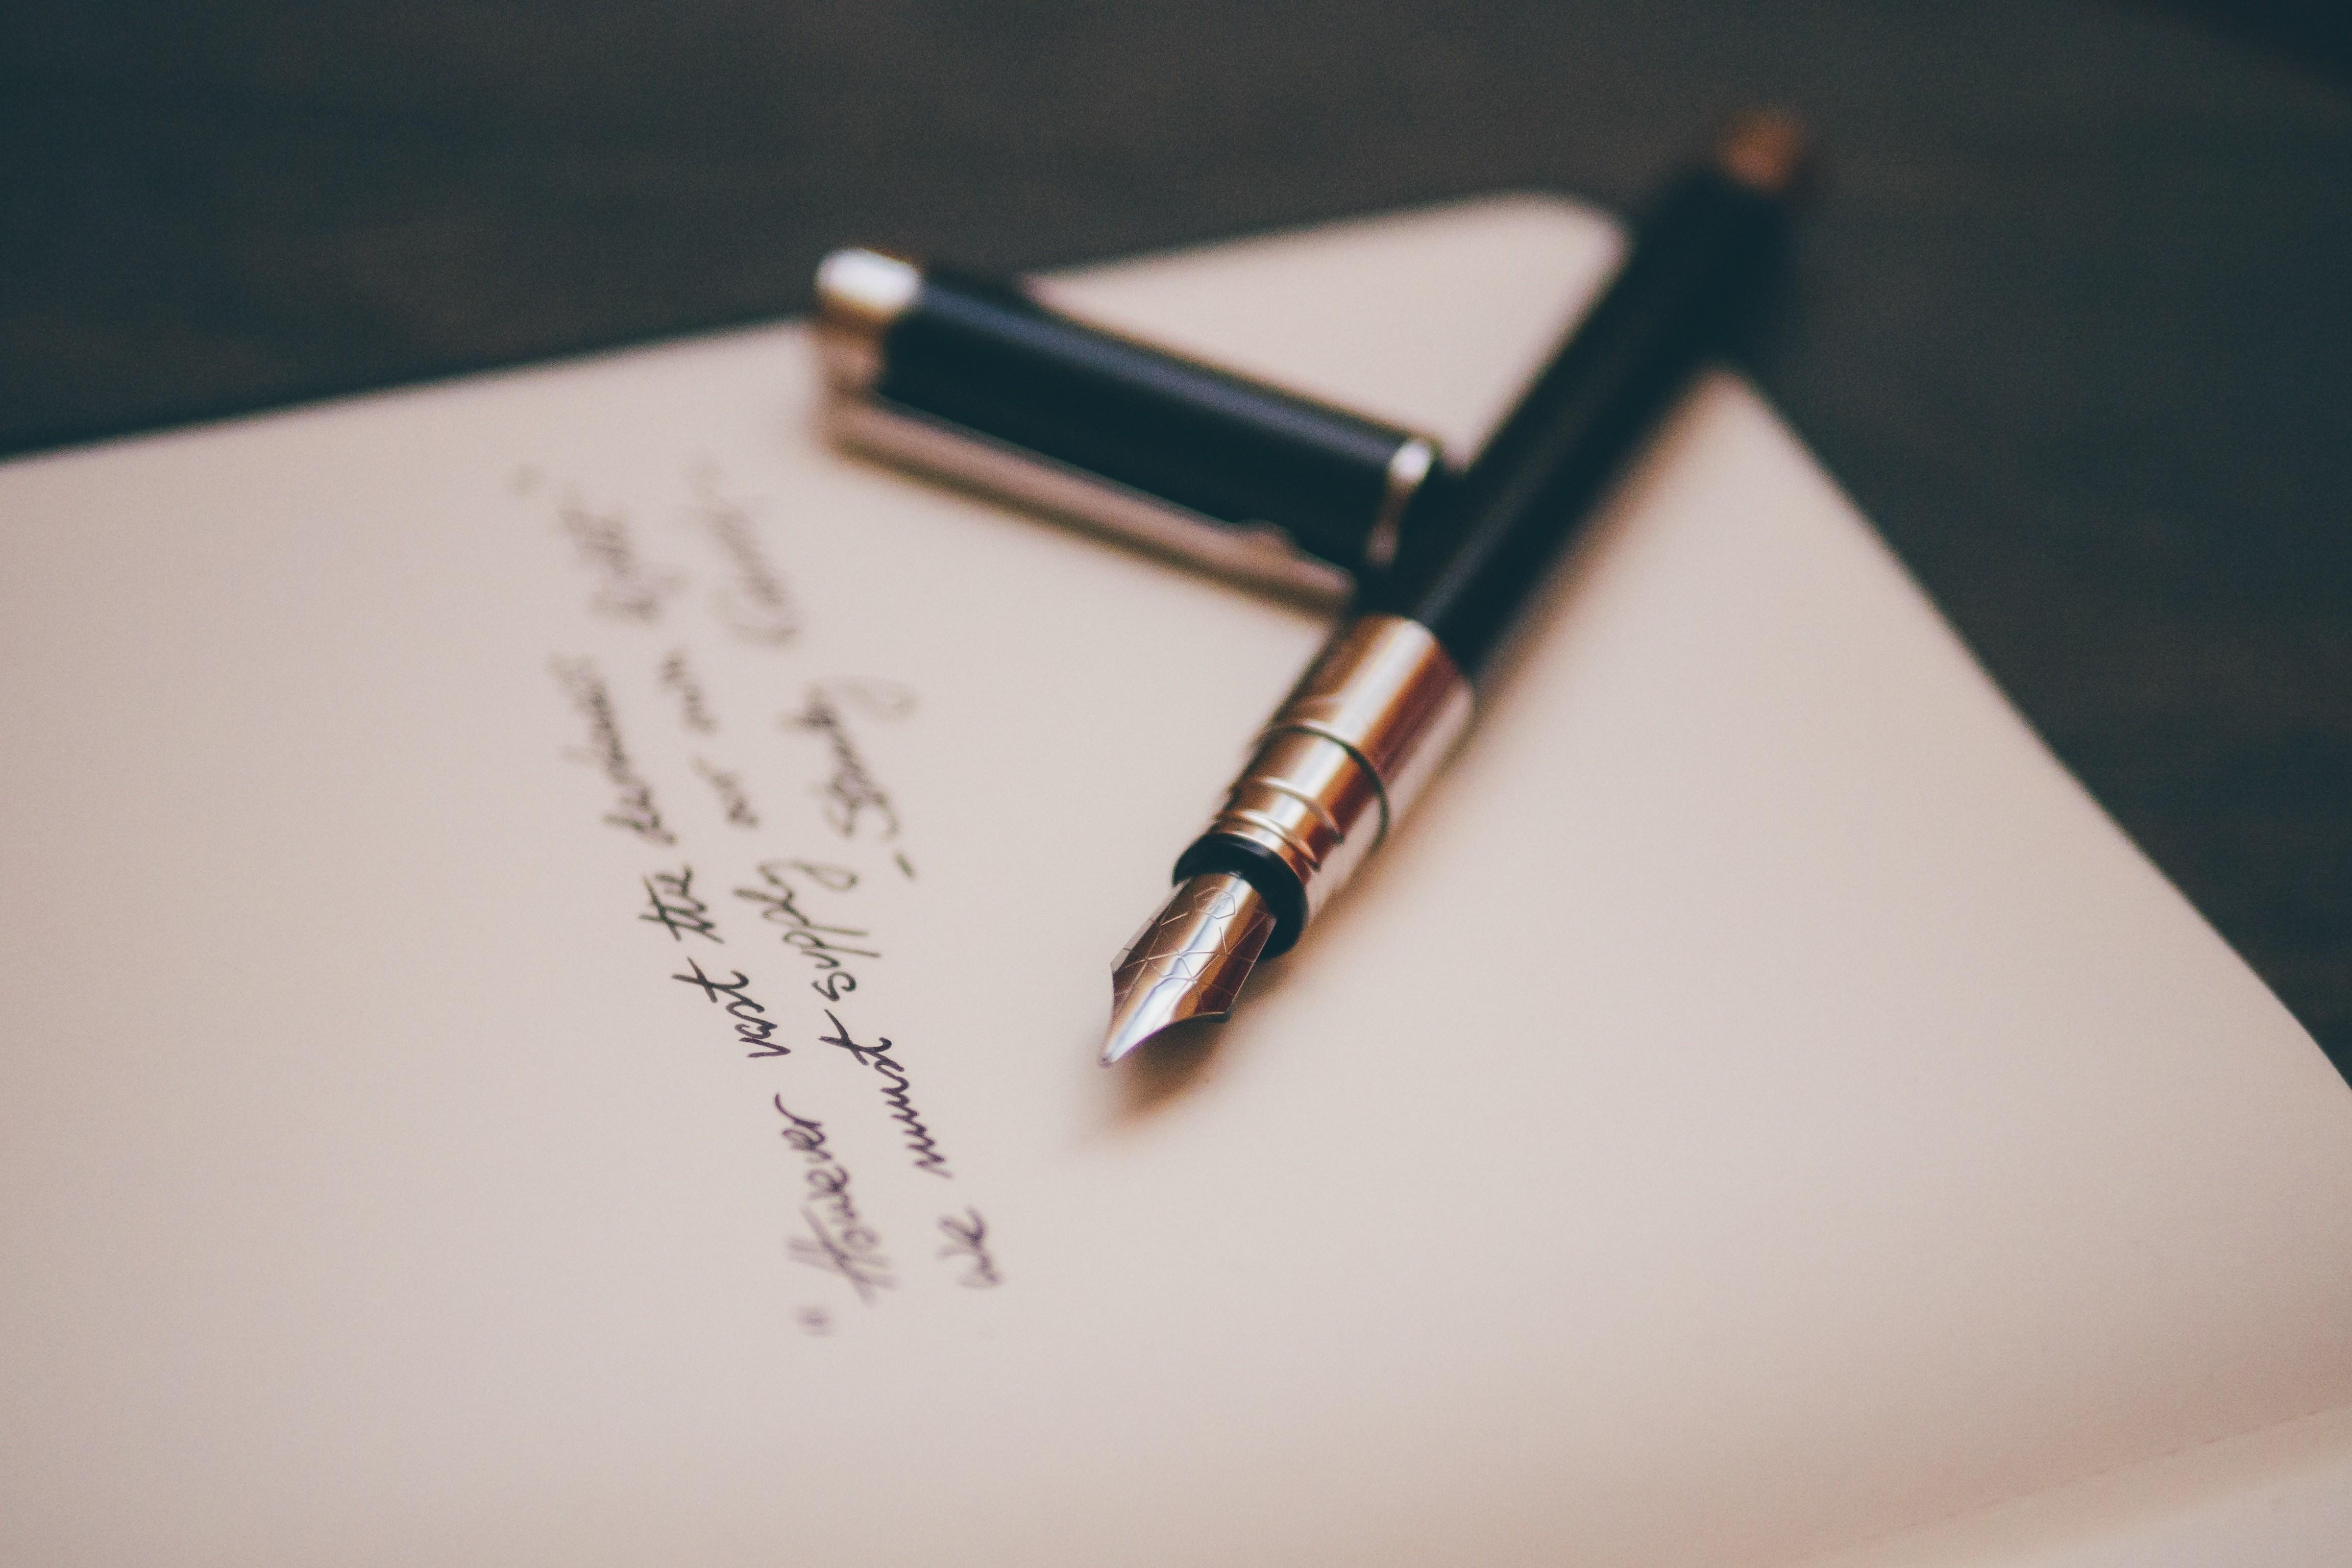 009 Write2fit46082c3072ssl1 Ptcas Essay Unusual 2019 Examples 2018 Tips Full